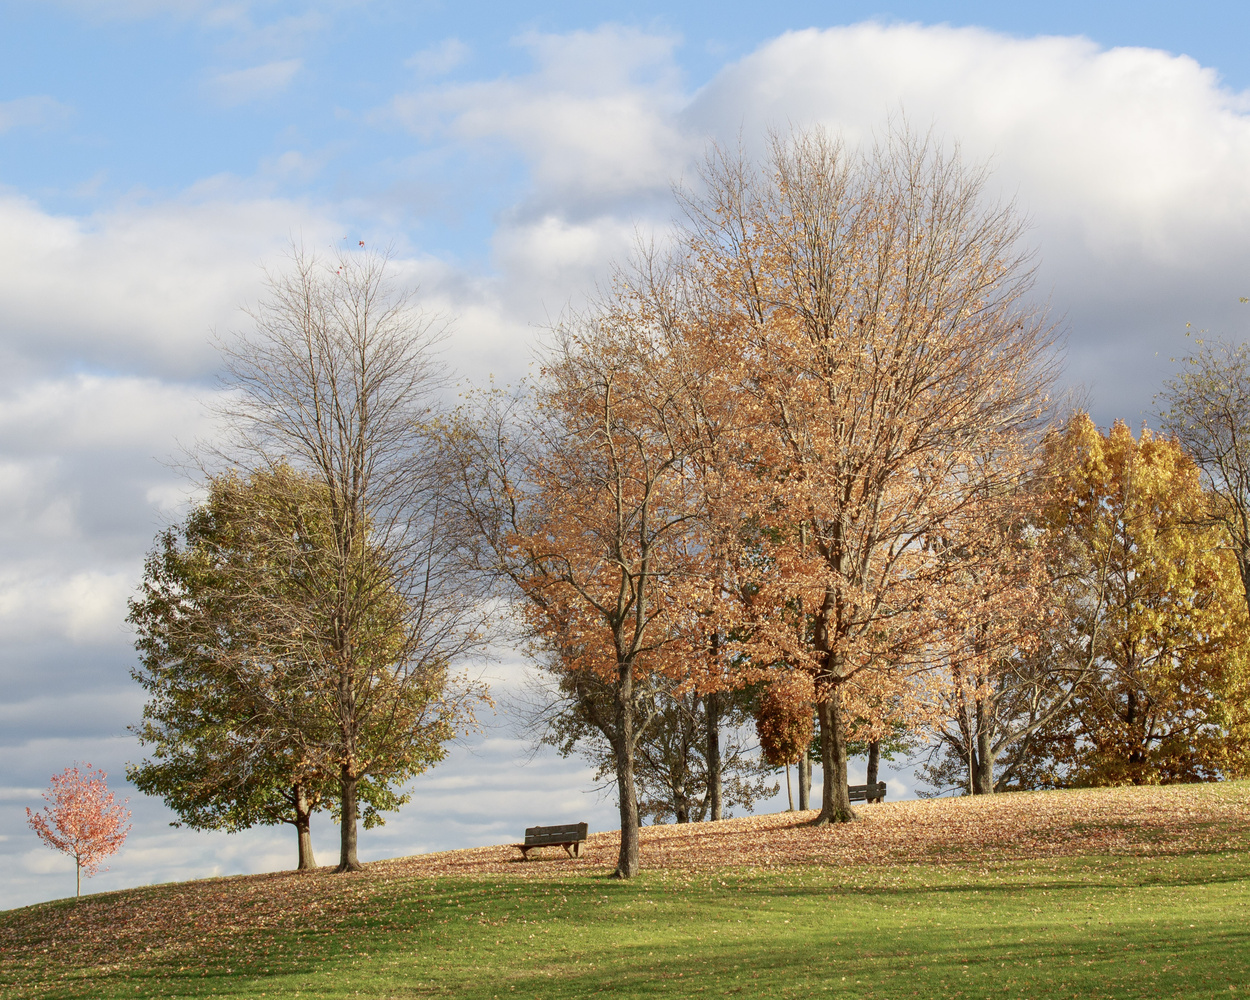 Fall down the Hill by Jason Huppert